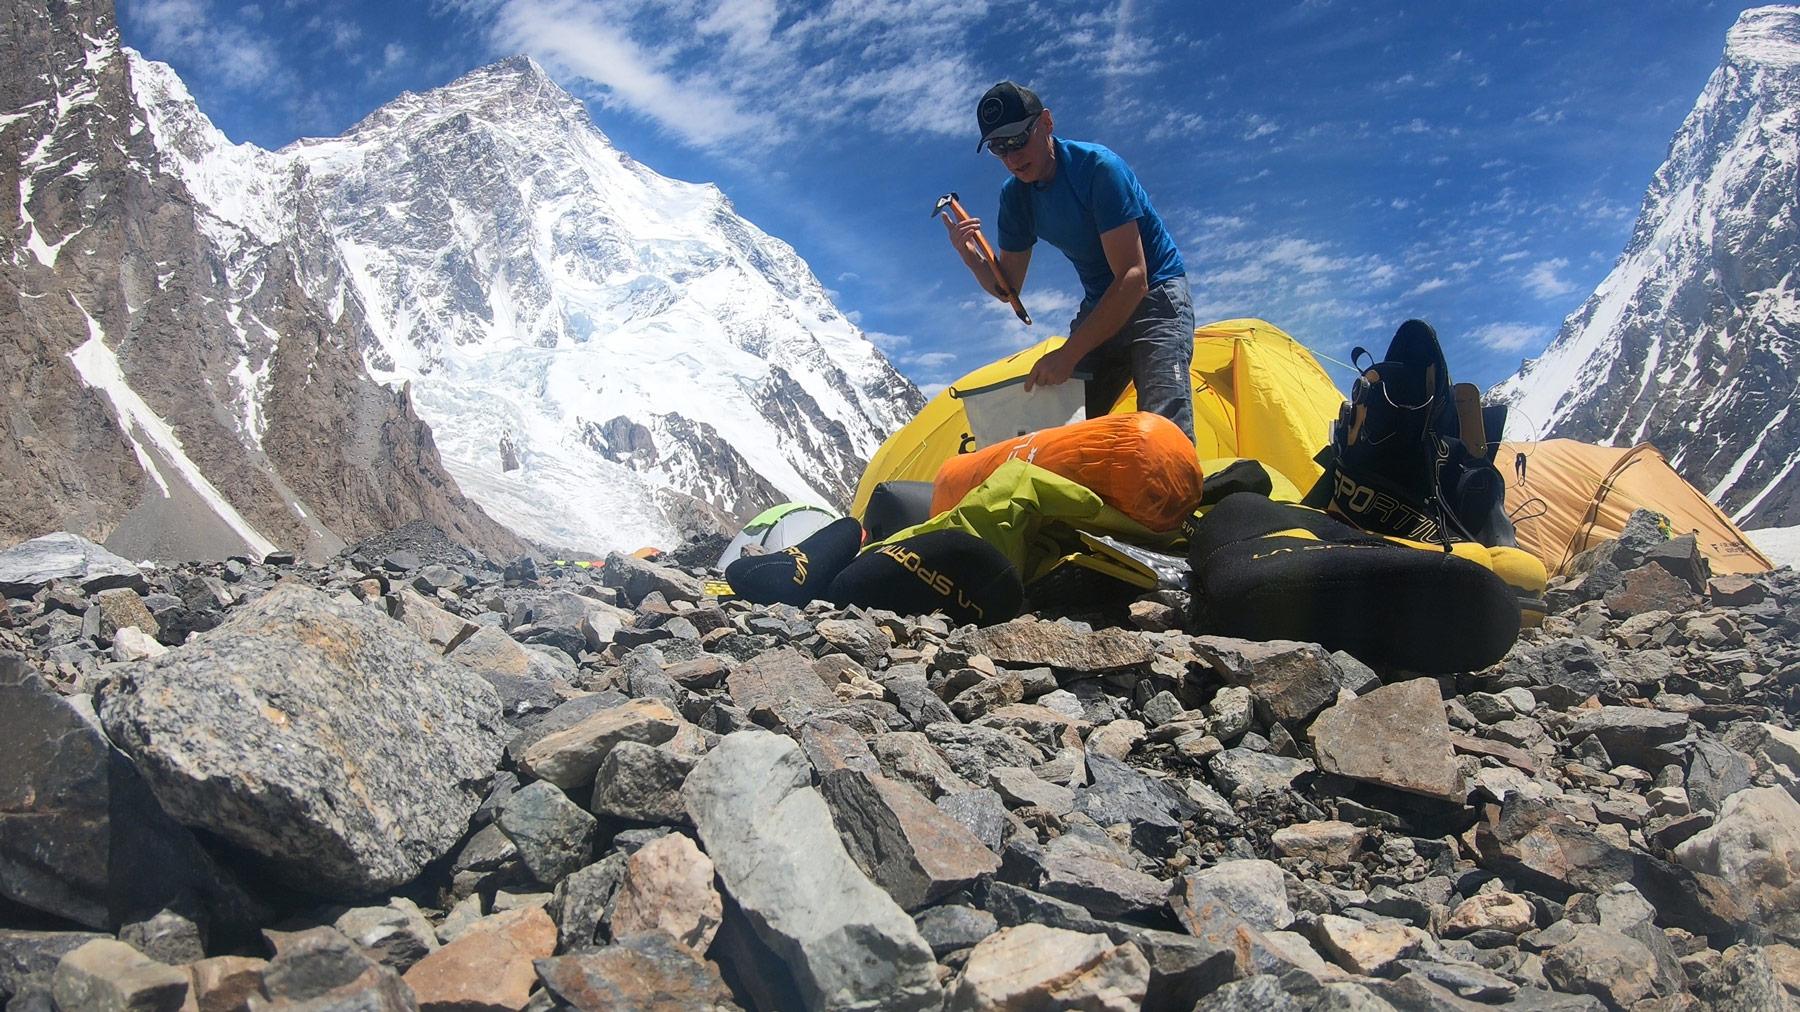 Rucksack Packen vor dem K2, inklusive Gleitschirm, Max Berger I bergundsteigen.blog